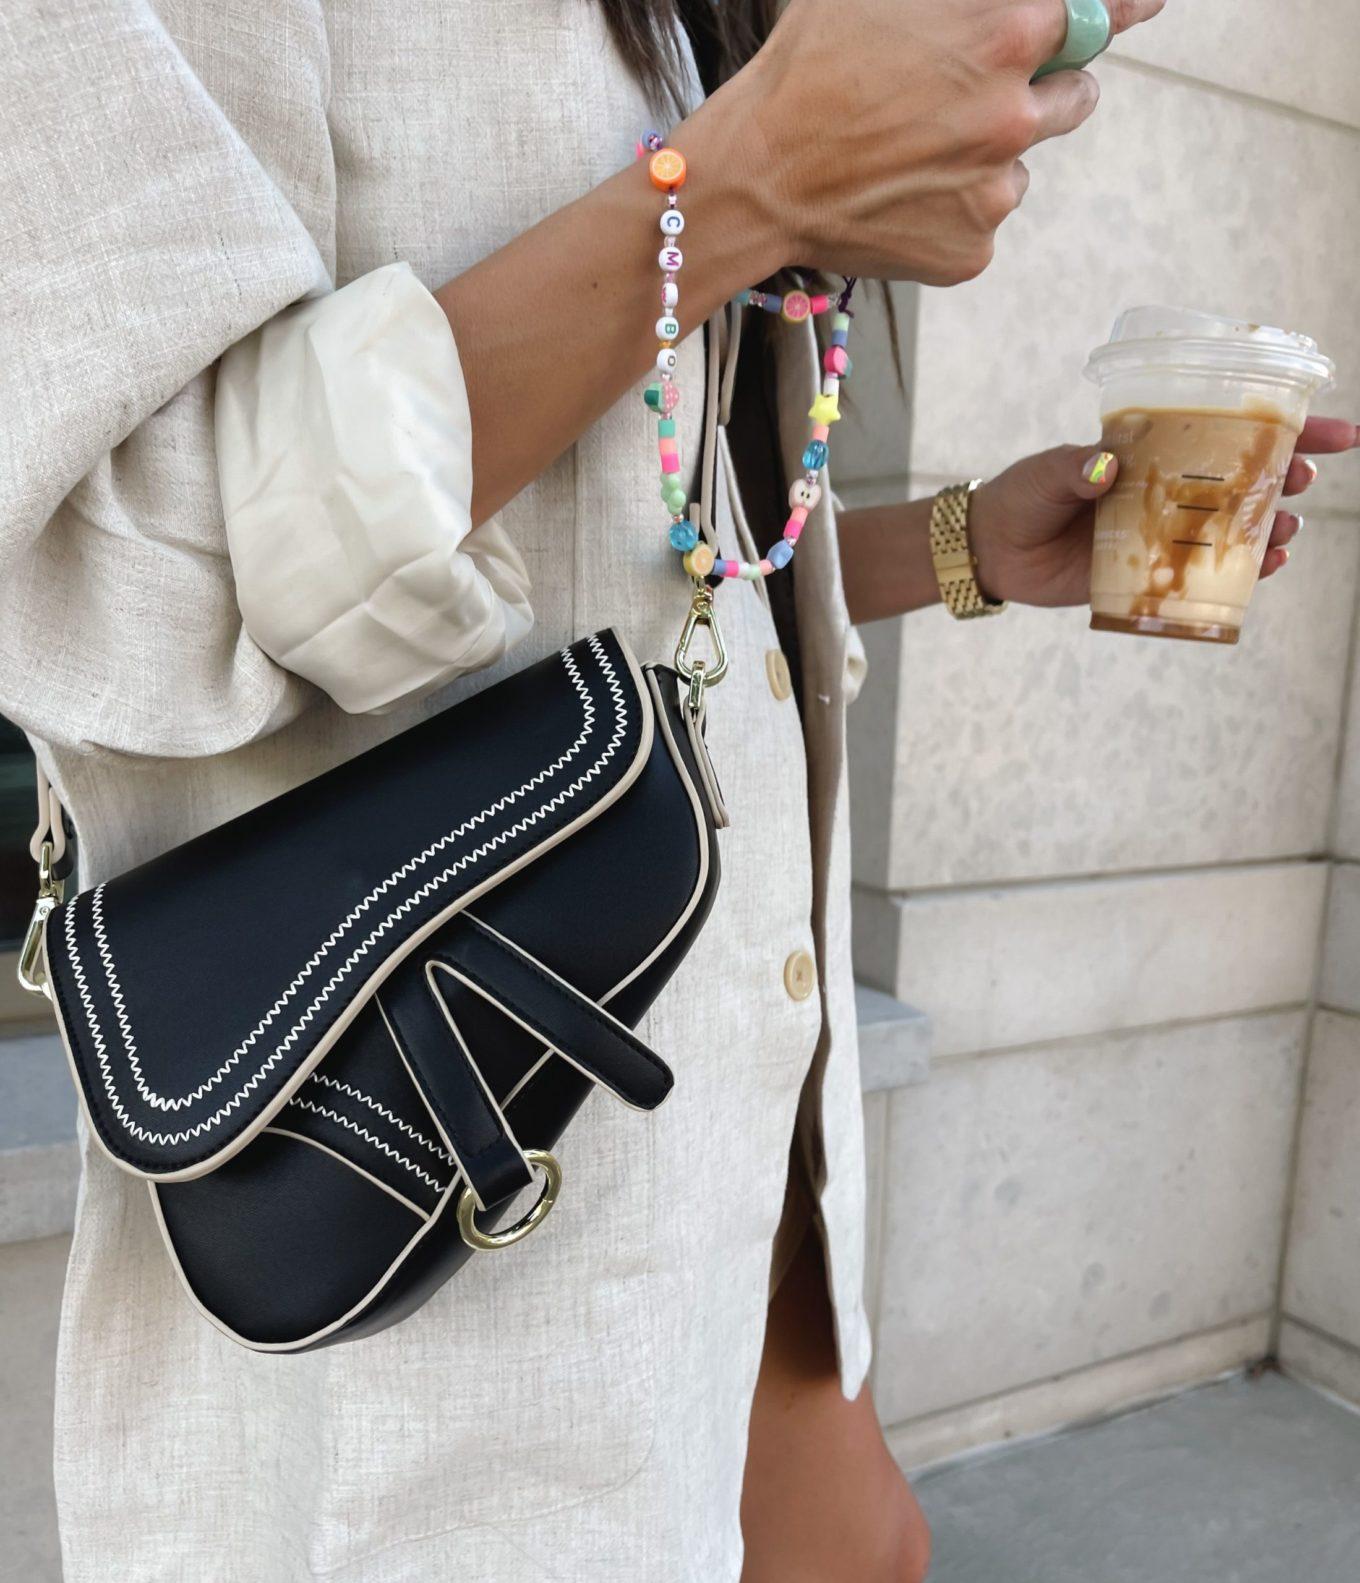 amazon fashion, under $100, amazon, blazer, bag, dress